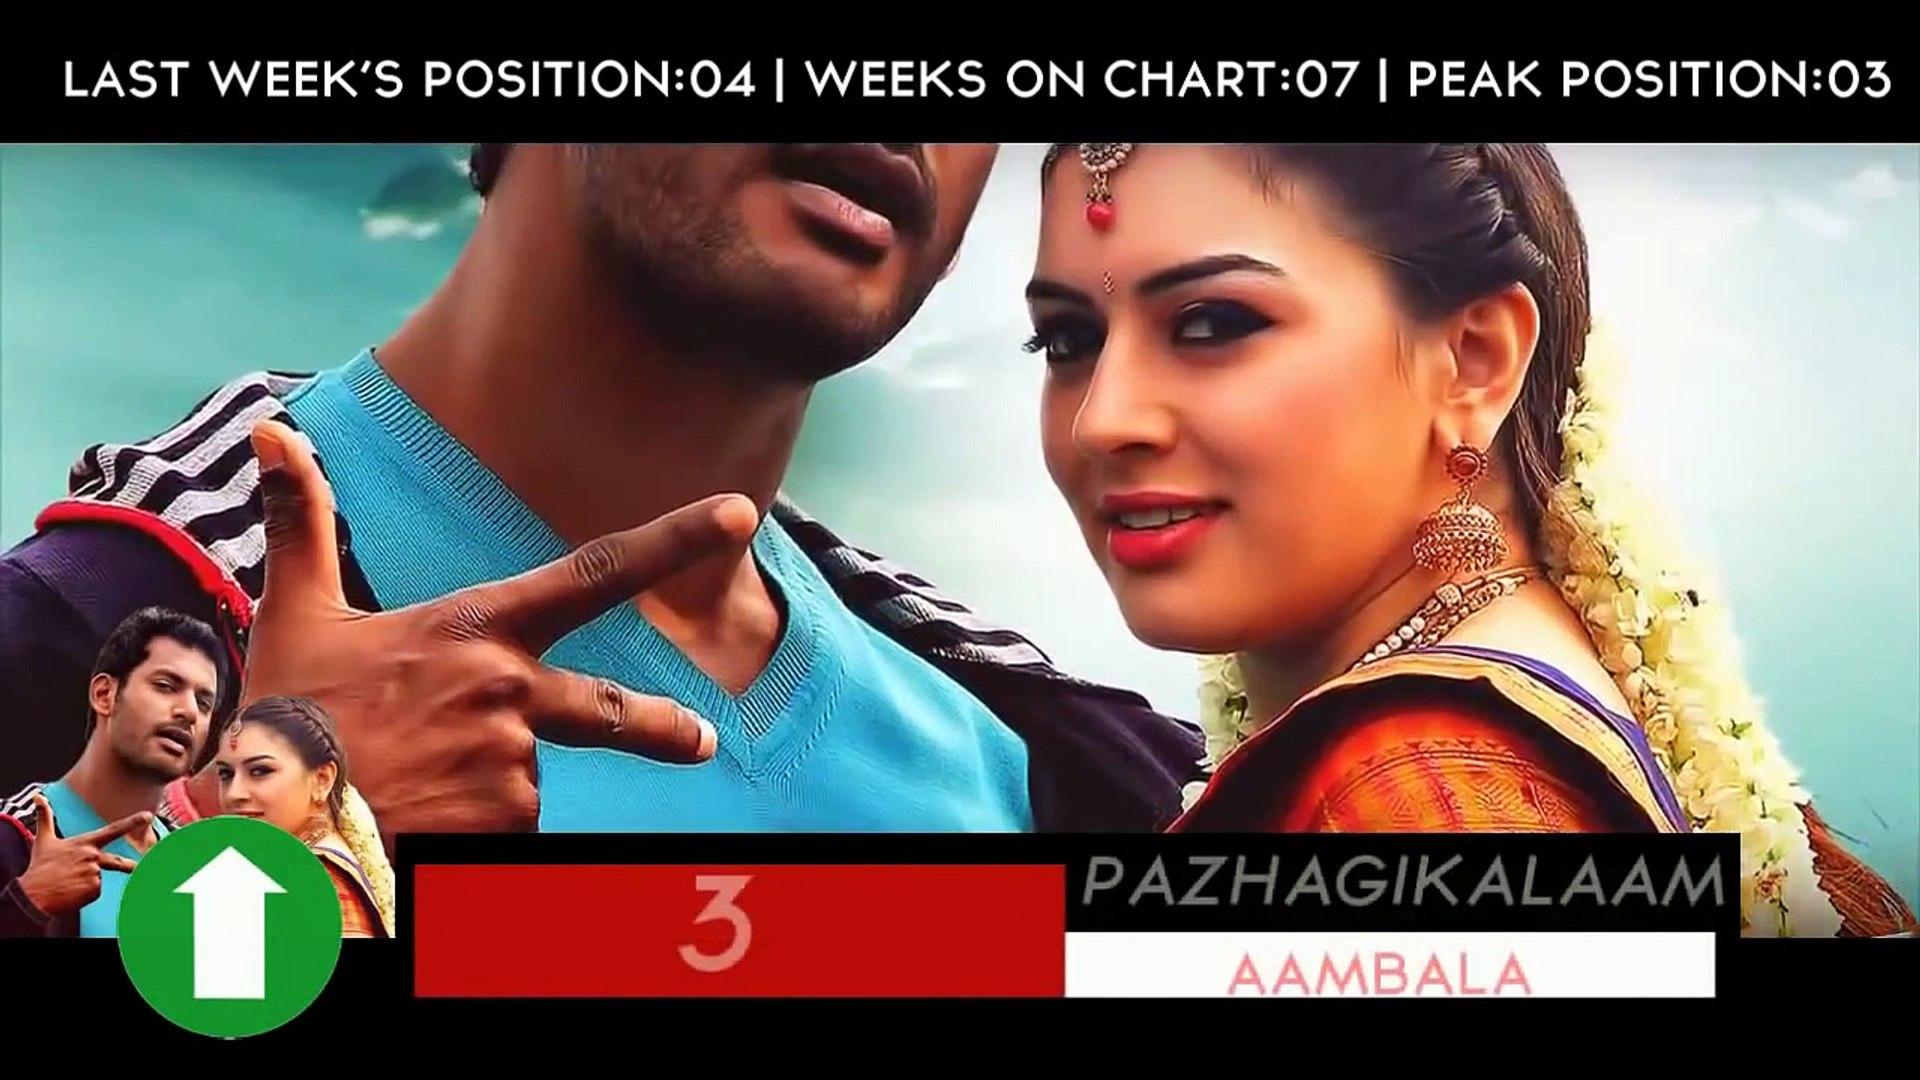 Top 10 Tamil Songs Of The Week - 30, January 2015 - New Tamil Songs